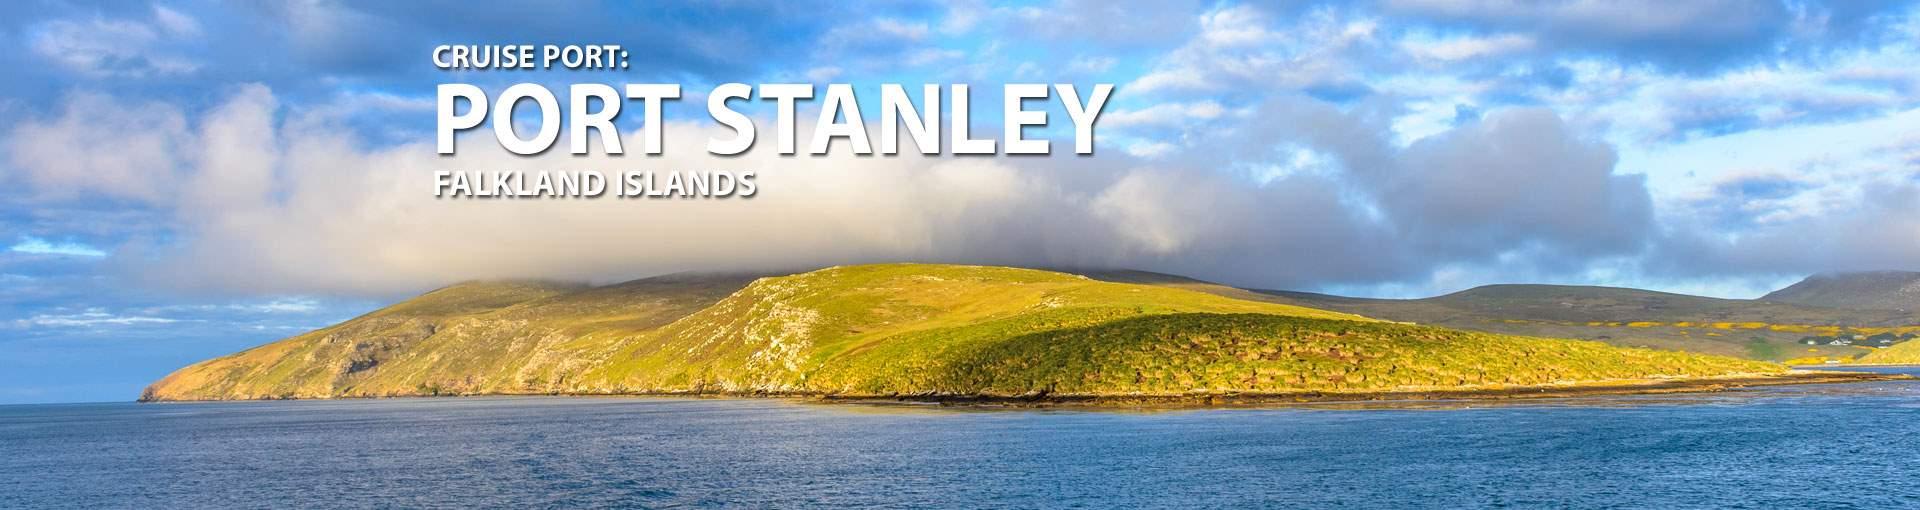 Cruises to Port Stanley, Falkland Islands